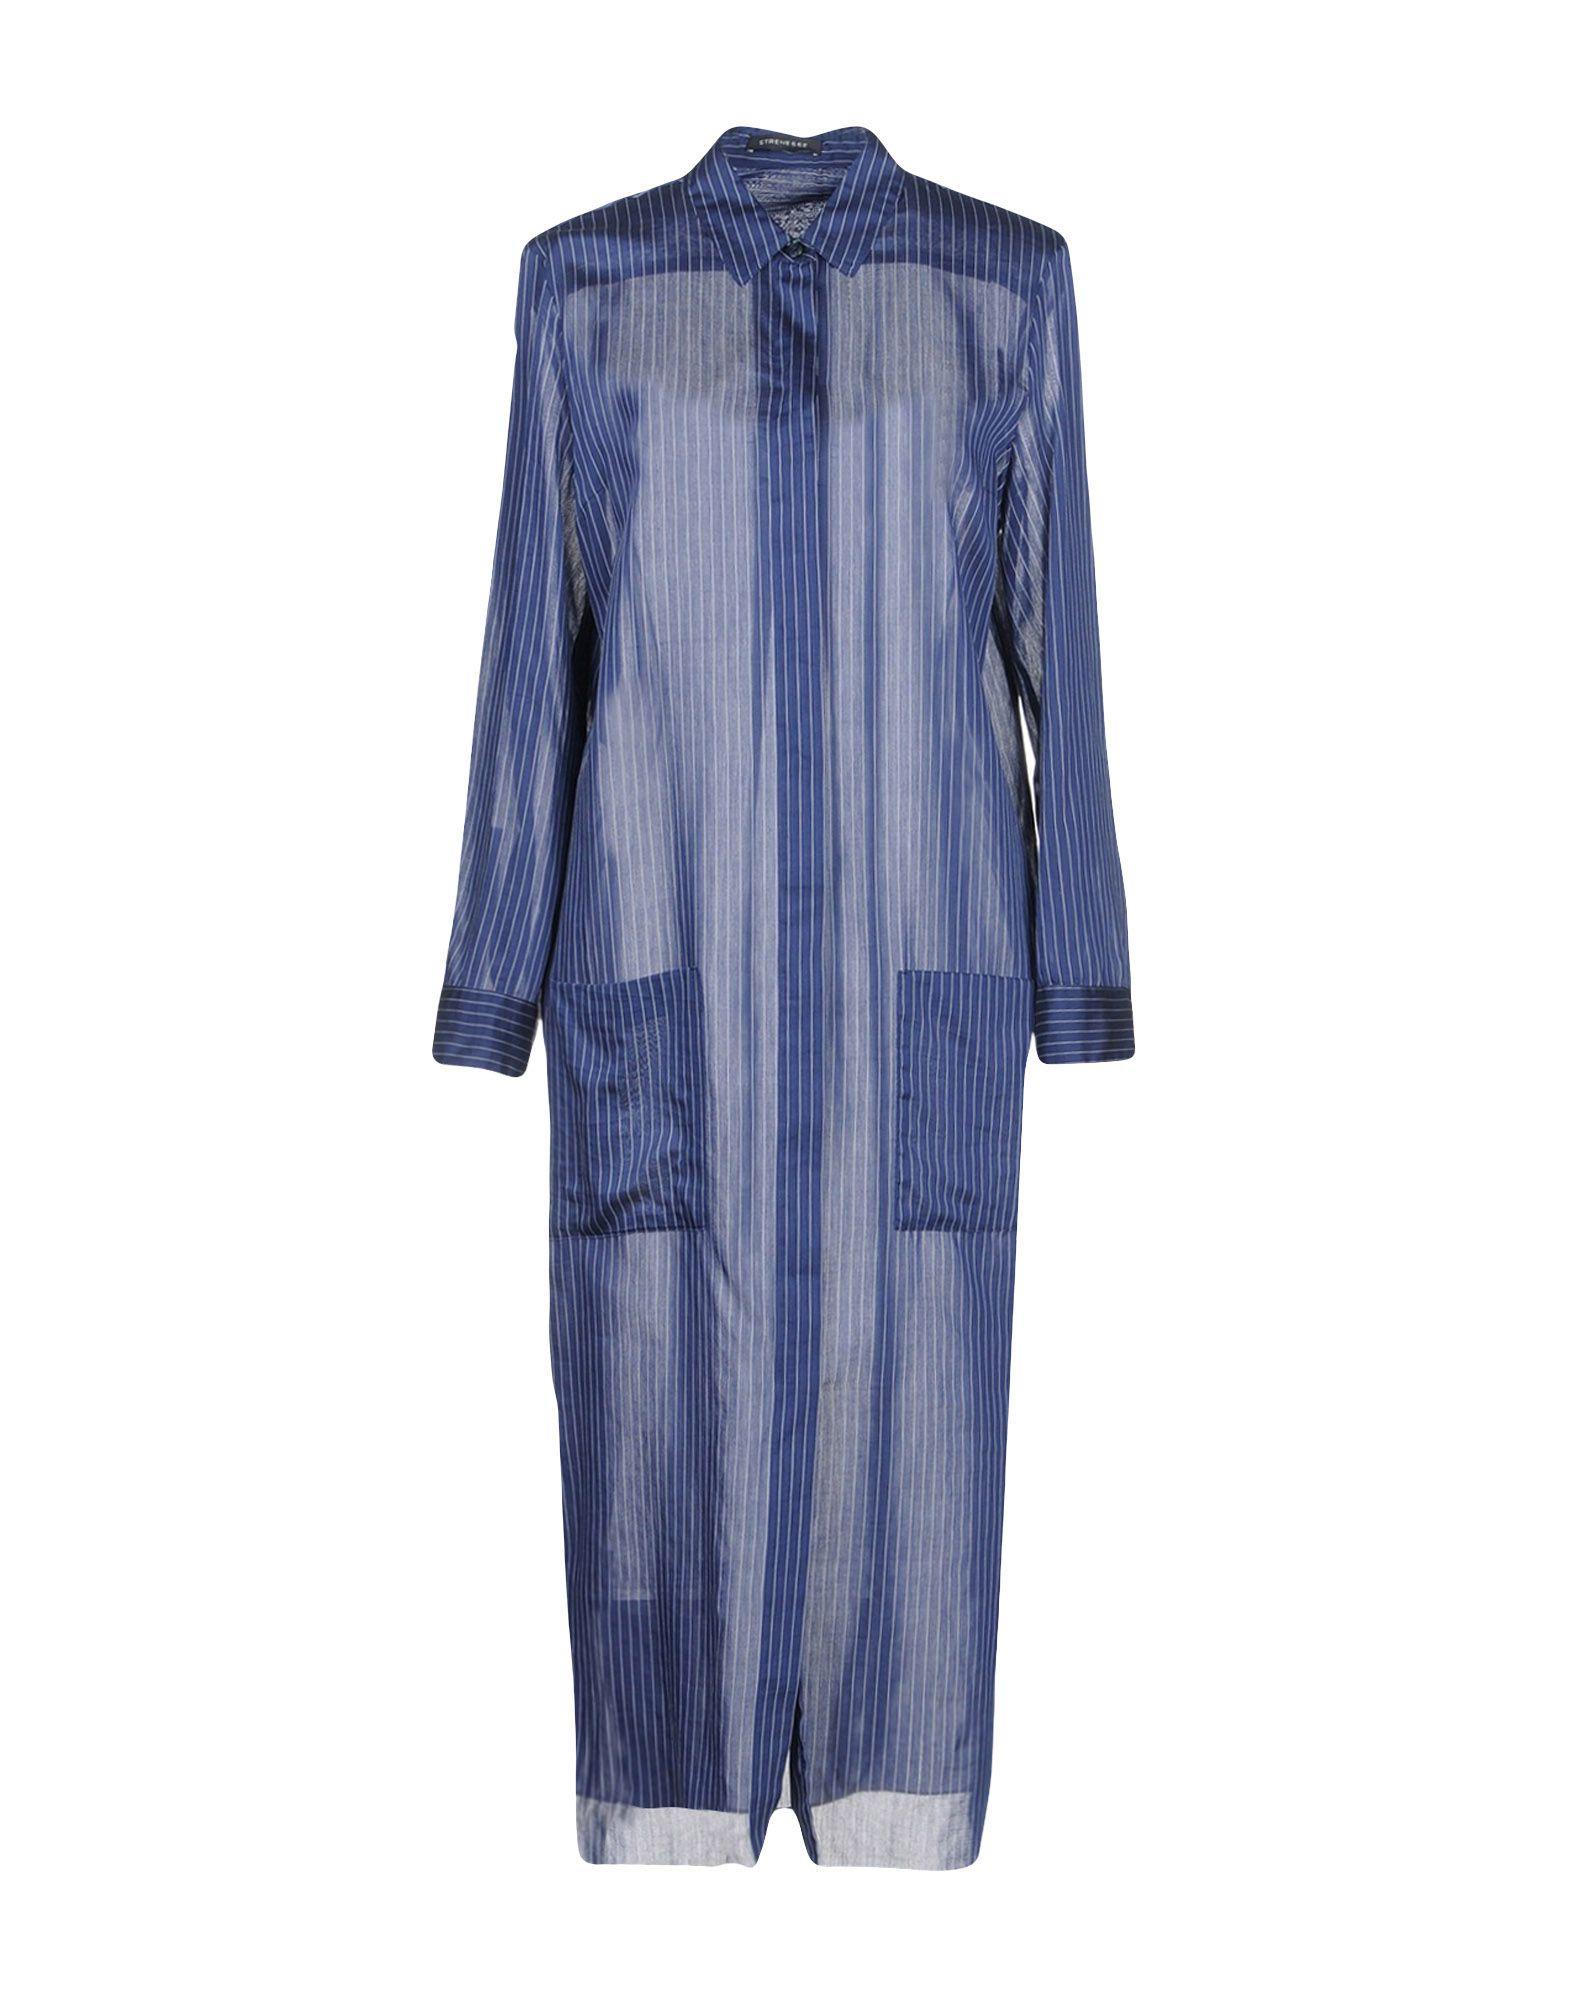 STRENESSE Платье длиной 3/4 lisa corti платье длиной 3 4